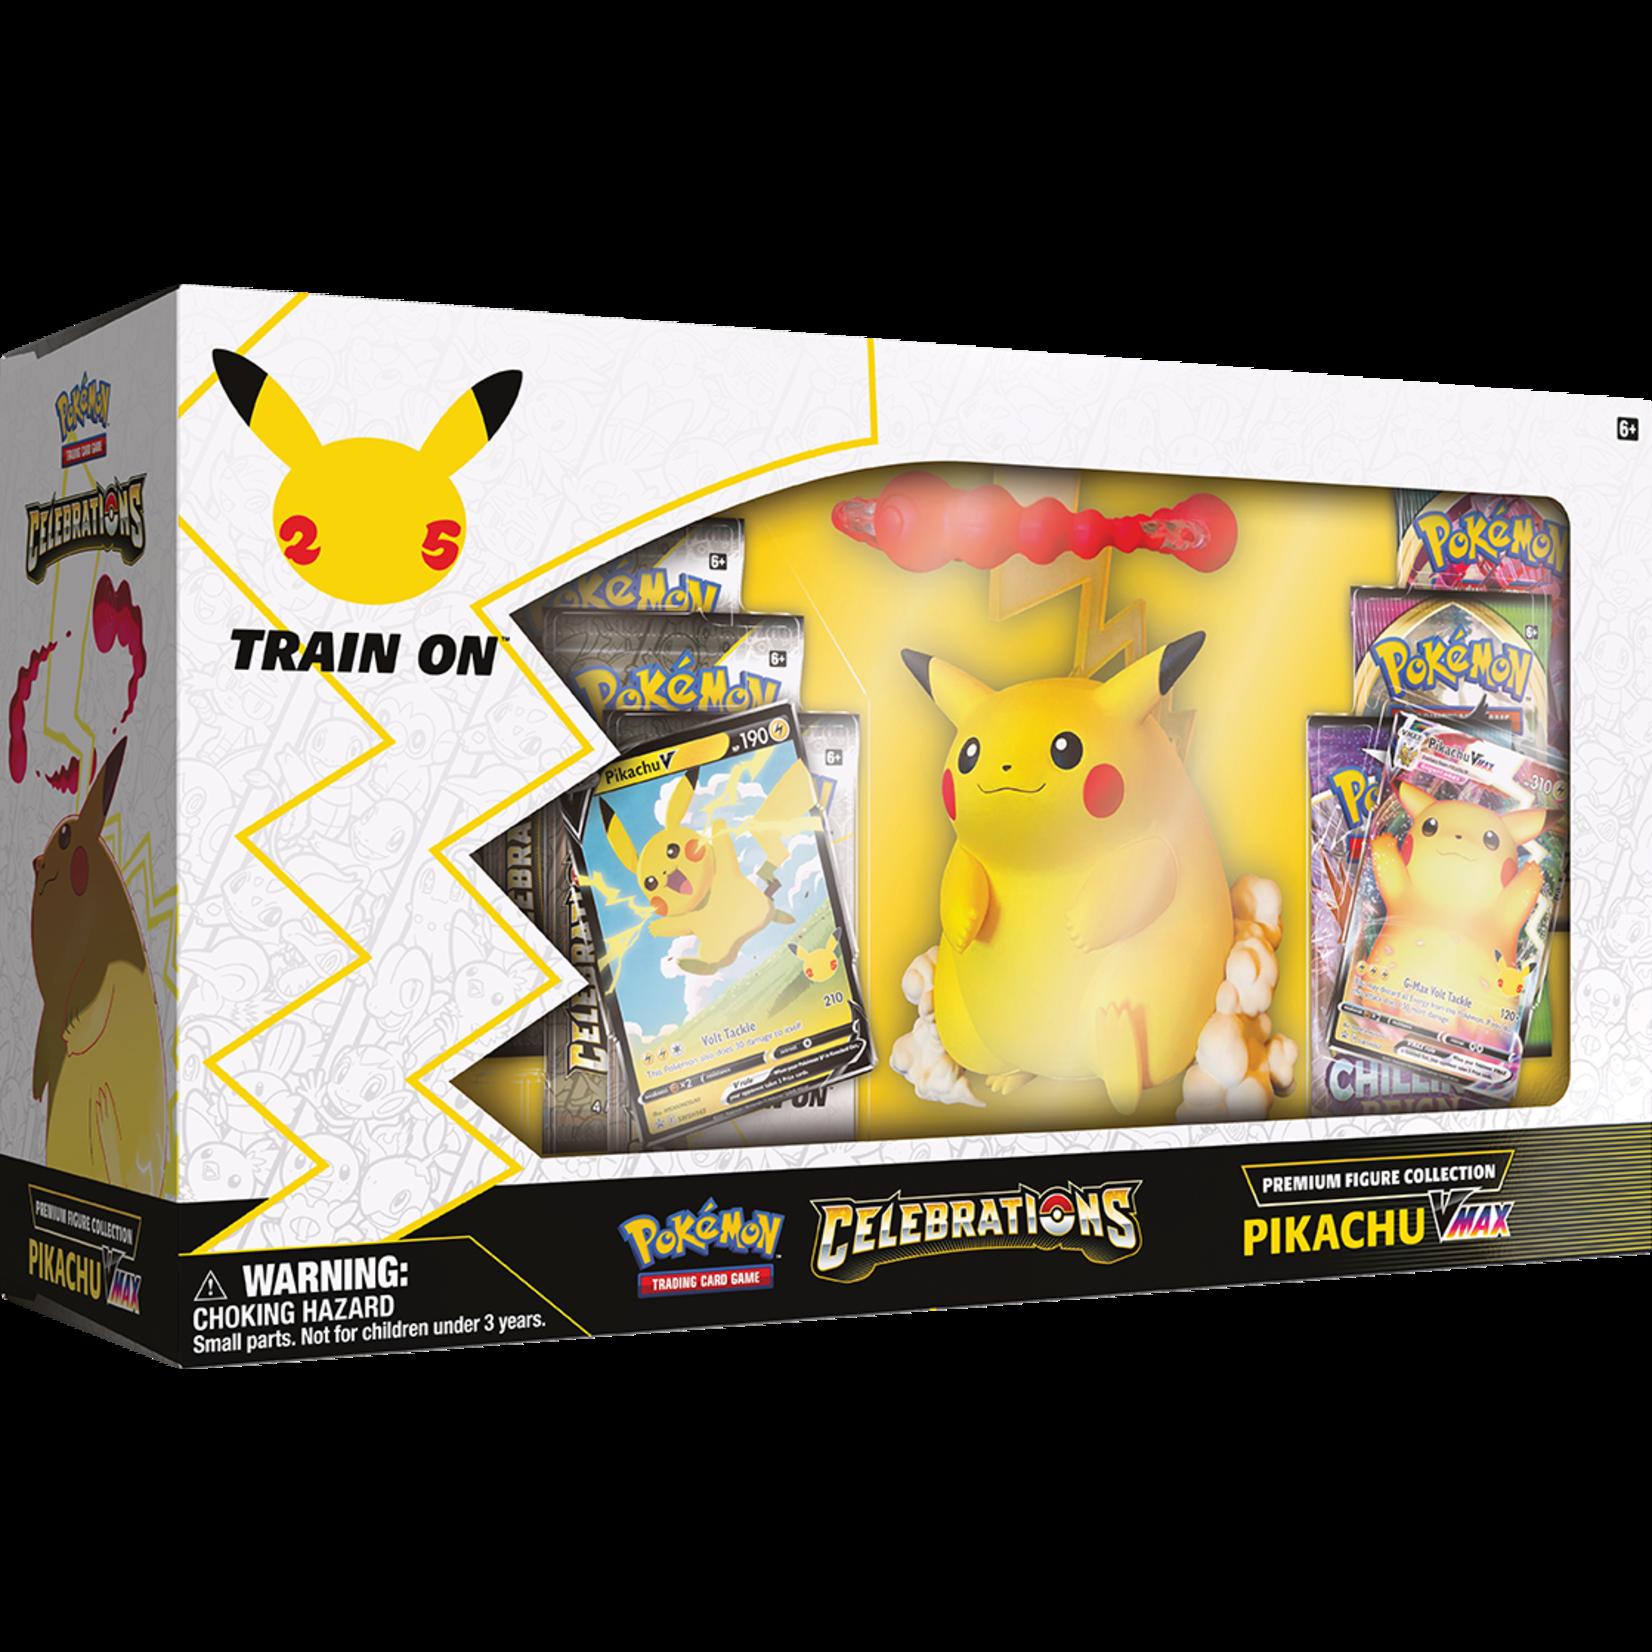 Pokémon Pokémon TCG: Celebrations Premium Figure Collection—Pikachu VMAX